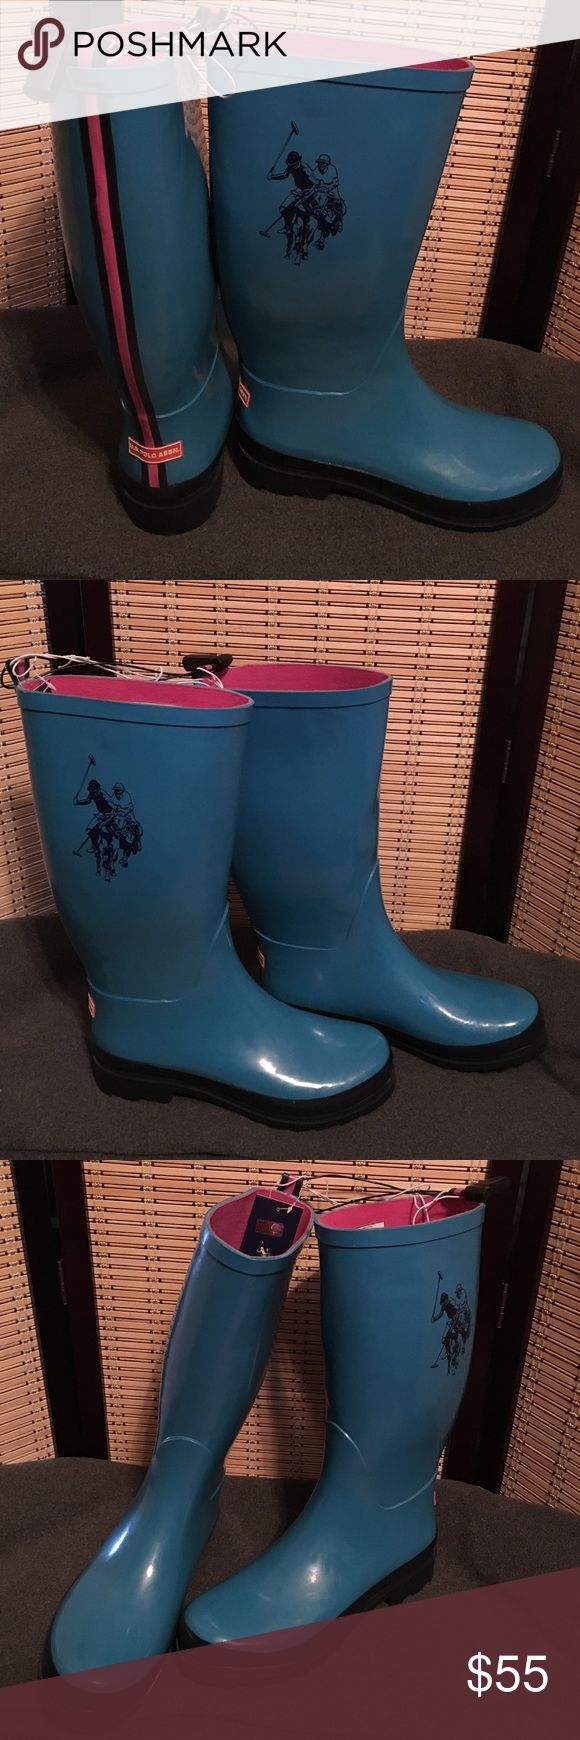 U.S. Polo association teal boots size 9 Teal U.S. Polo association boots size 9. Amazing pink lining. Super comfy. Waterproof. U.S. Polo Assn. Shoes Winter & Rain Boots